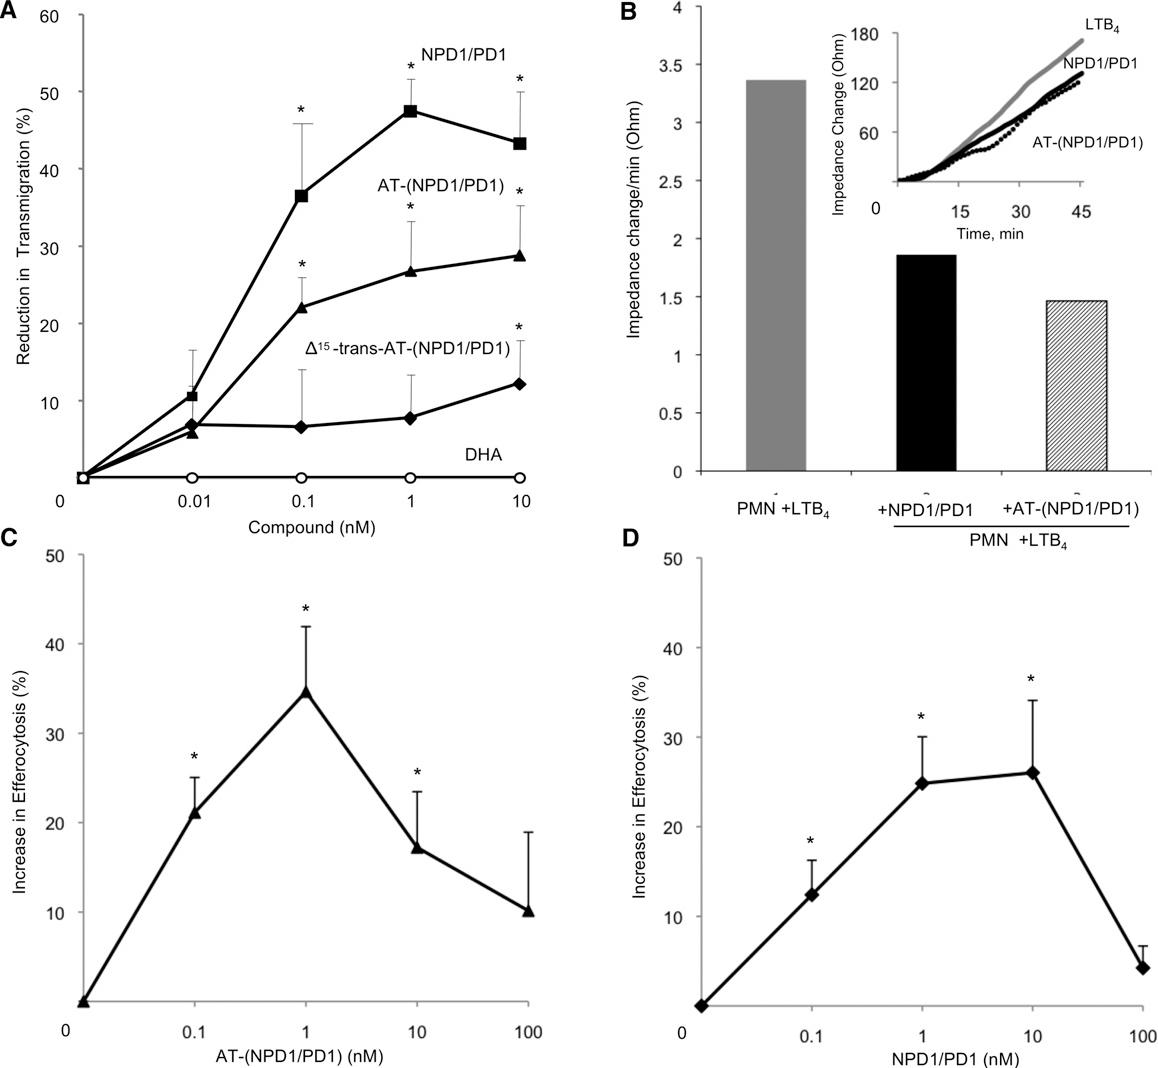 Figure 6. AT-(NPD1/PD1) Limits Human PMN Transmigration Across Human Endothelial Cells and Enhances Human Macrophage Efferocytosis of Apoptotic Human PMNs